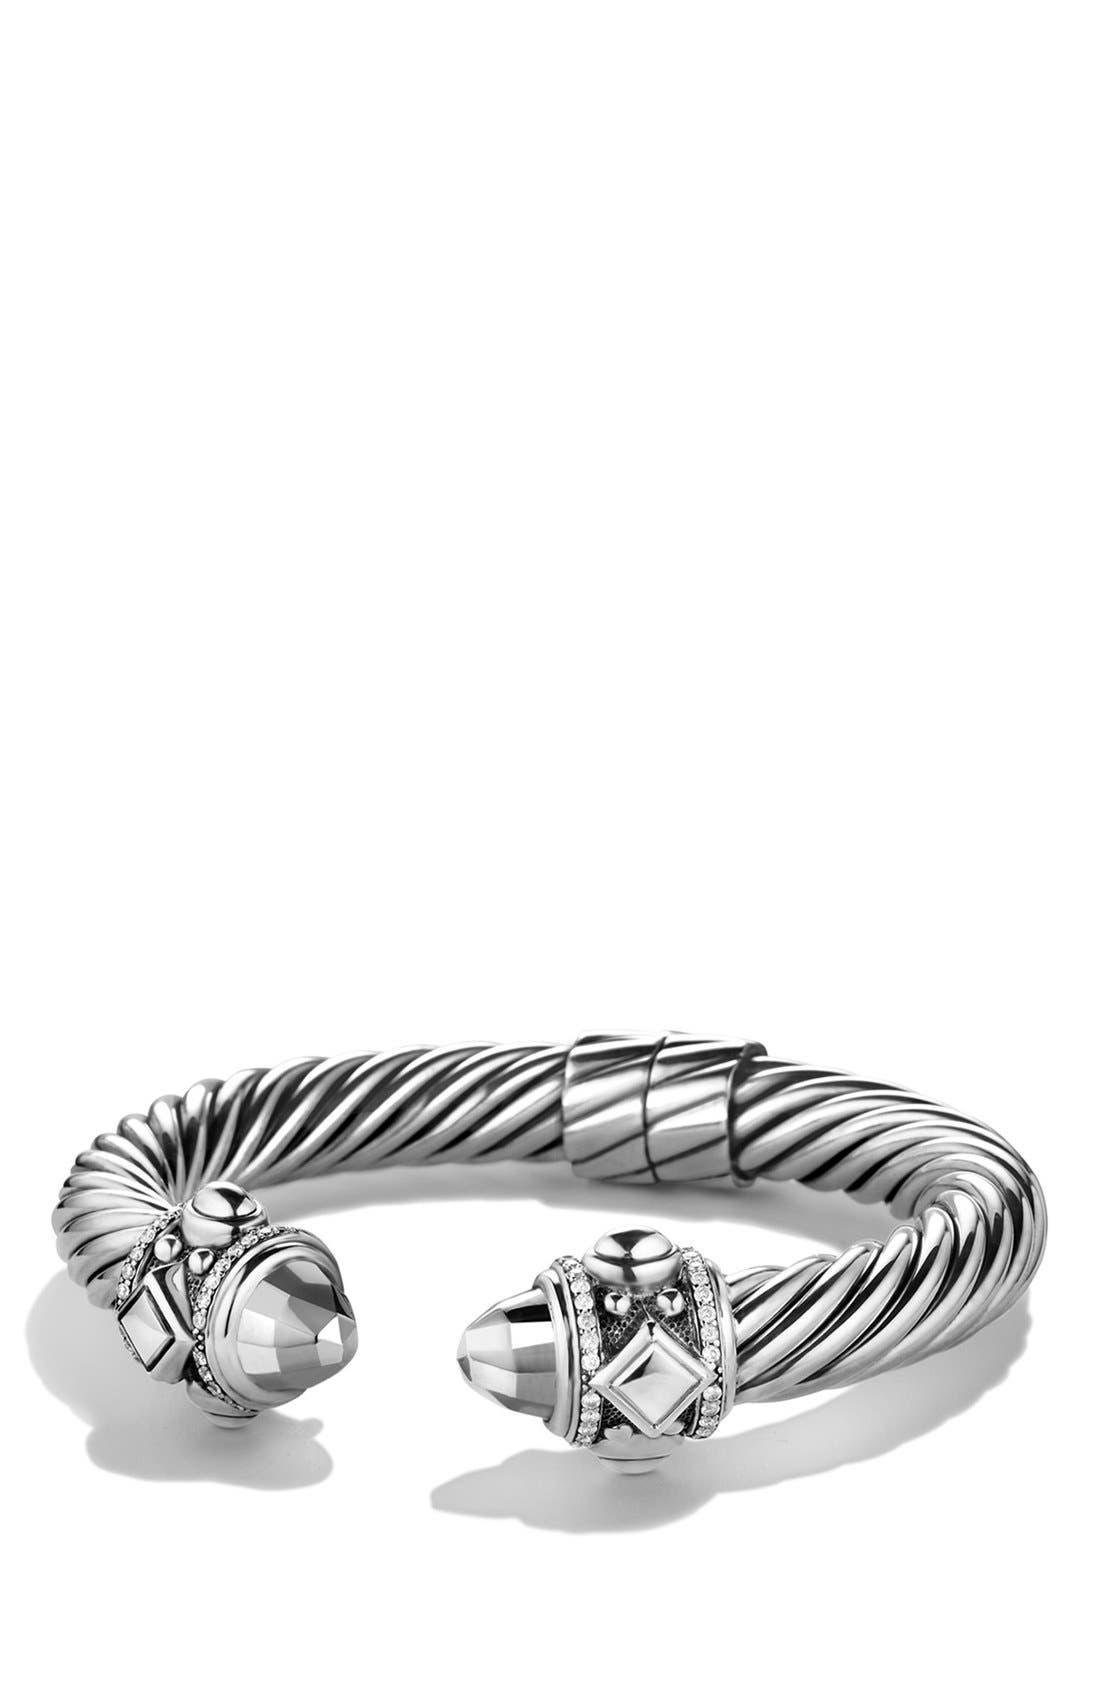 Main Image - David Yurman 'Renaissance' Bracelet with Black Diamonds